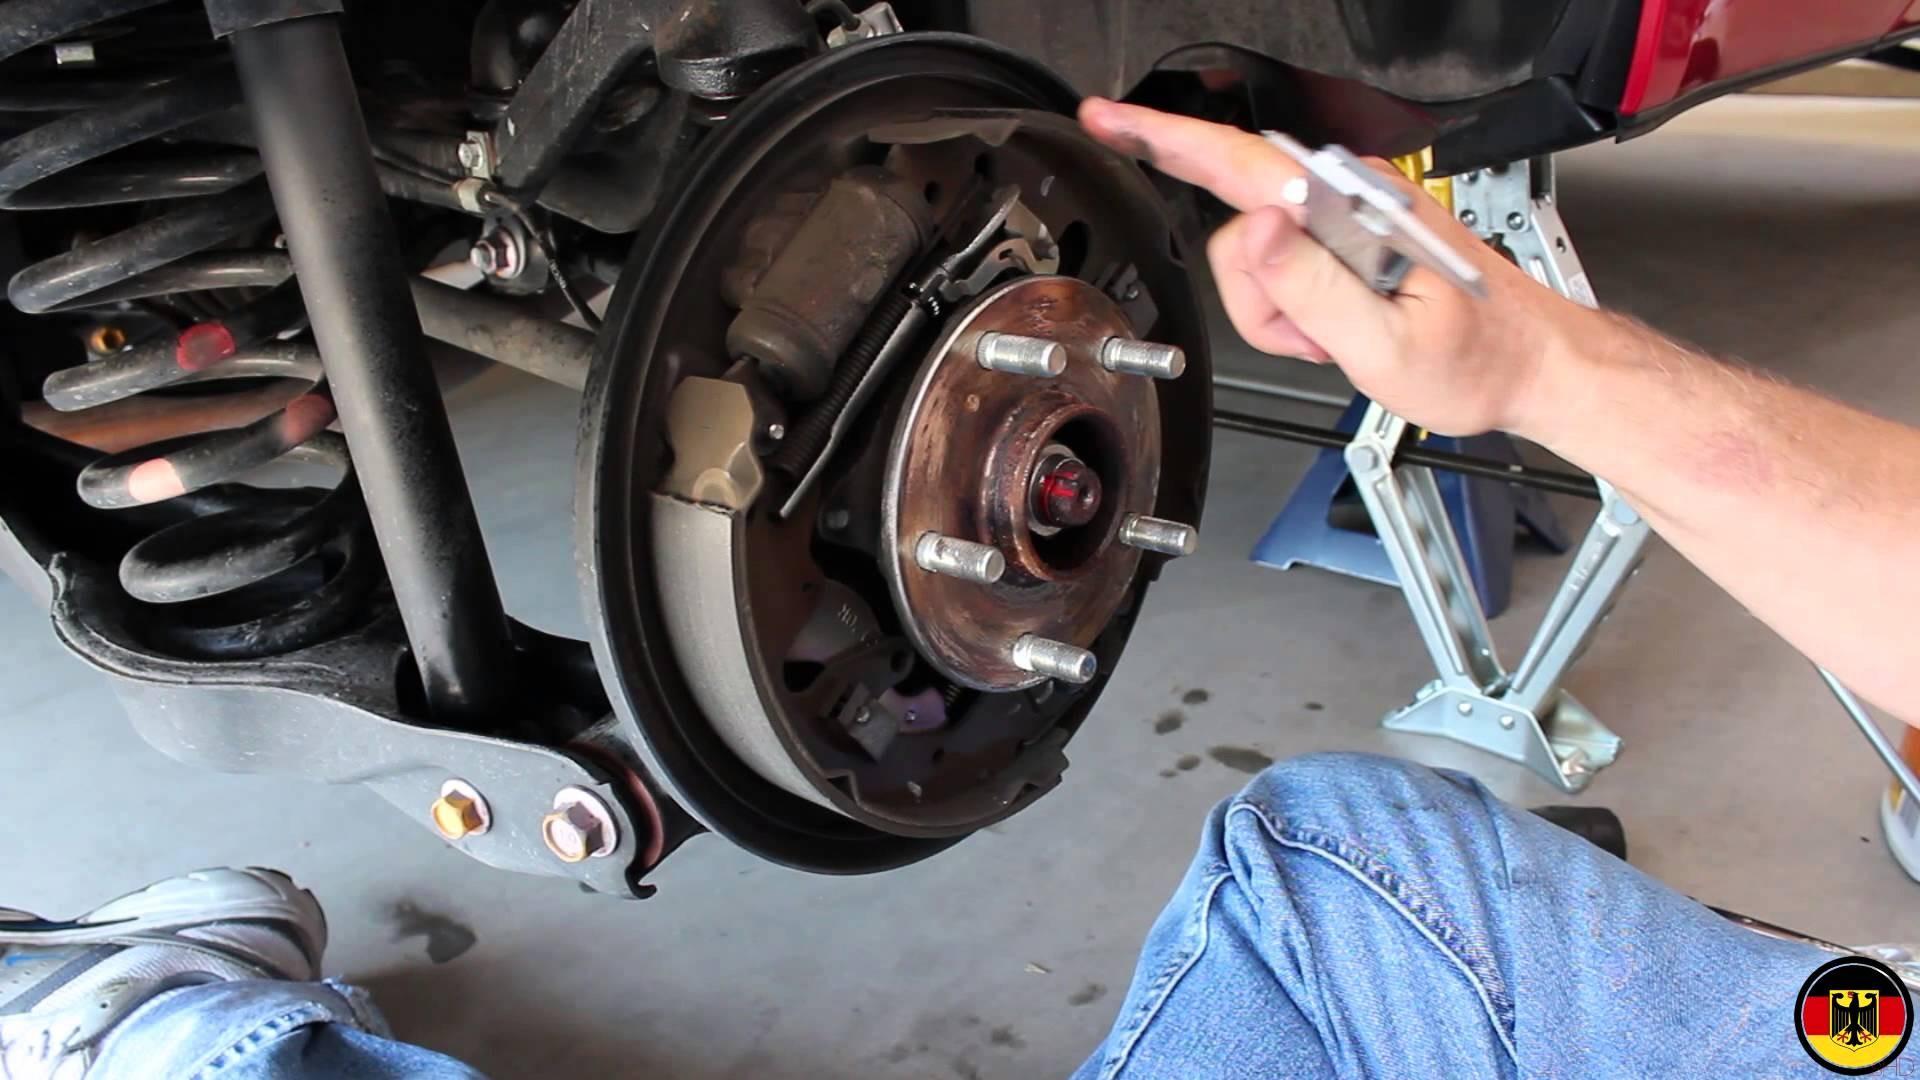 Brake Drum Diagram Suzuki Grand Vitara Rear Brake Drum Inspection Of Brake Drum Diagram